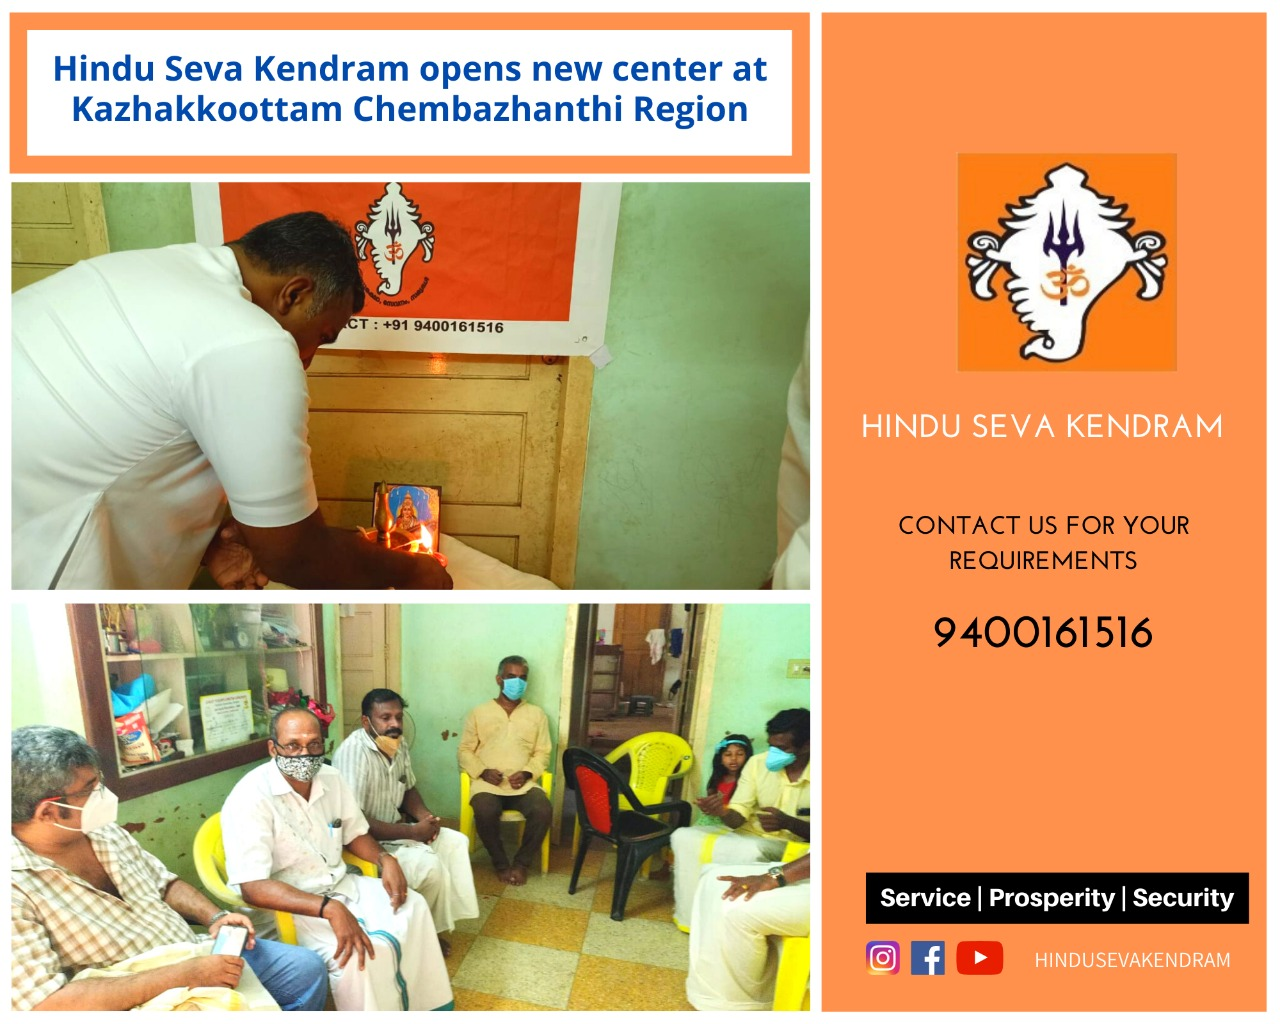 Hindu Seva Kendram opens new center at Kazhakkoottam Chembazhanthi Region